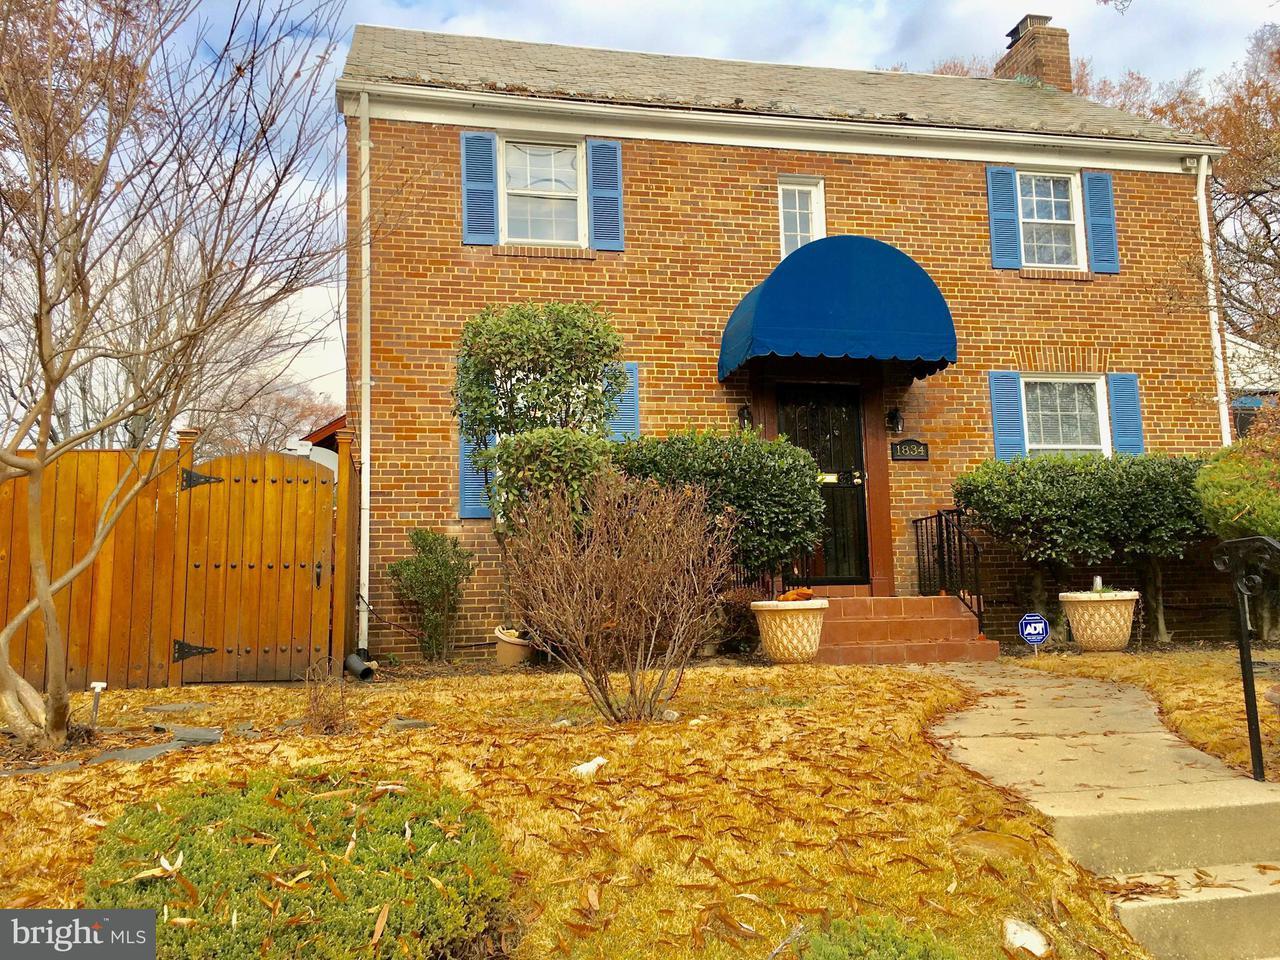 Single Family Home for Sale at 1834 UPSHUR ST NE 1834 UPSHUR ST NE Washington, District Of Columbia 20018 United States